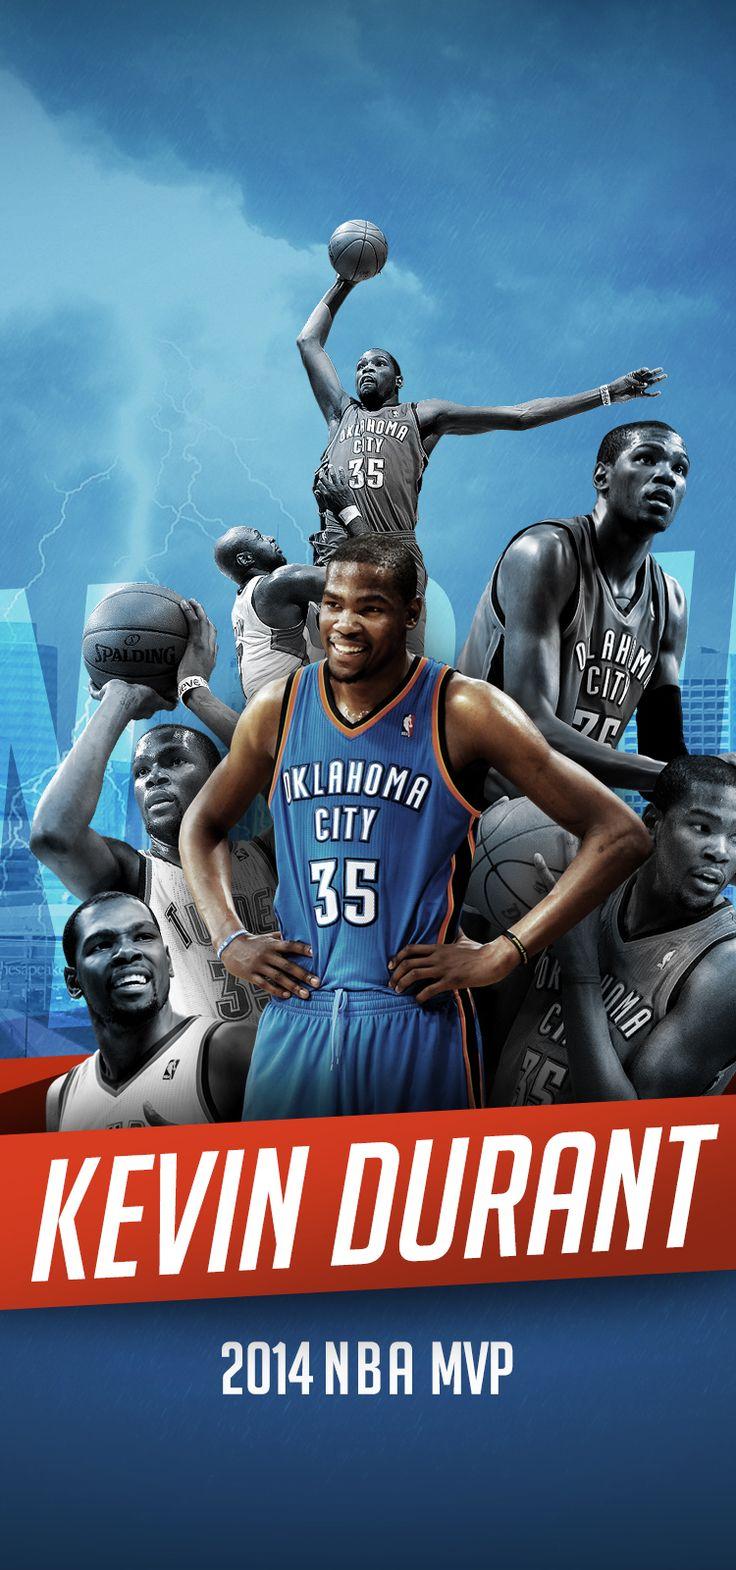 Kevin Durant NBA2K15 Fanart.  Full work at: https://www.behance.net/gallery/16825435/Kevin-Durant-NBA-2K15-Fan-made